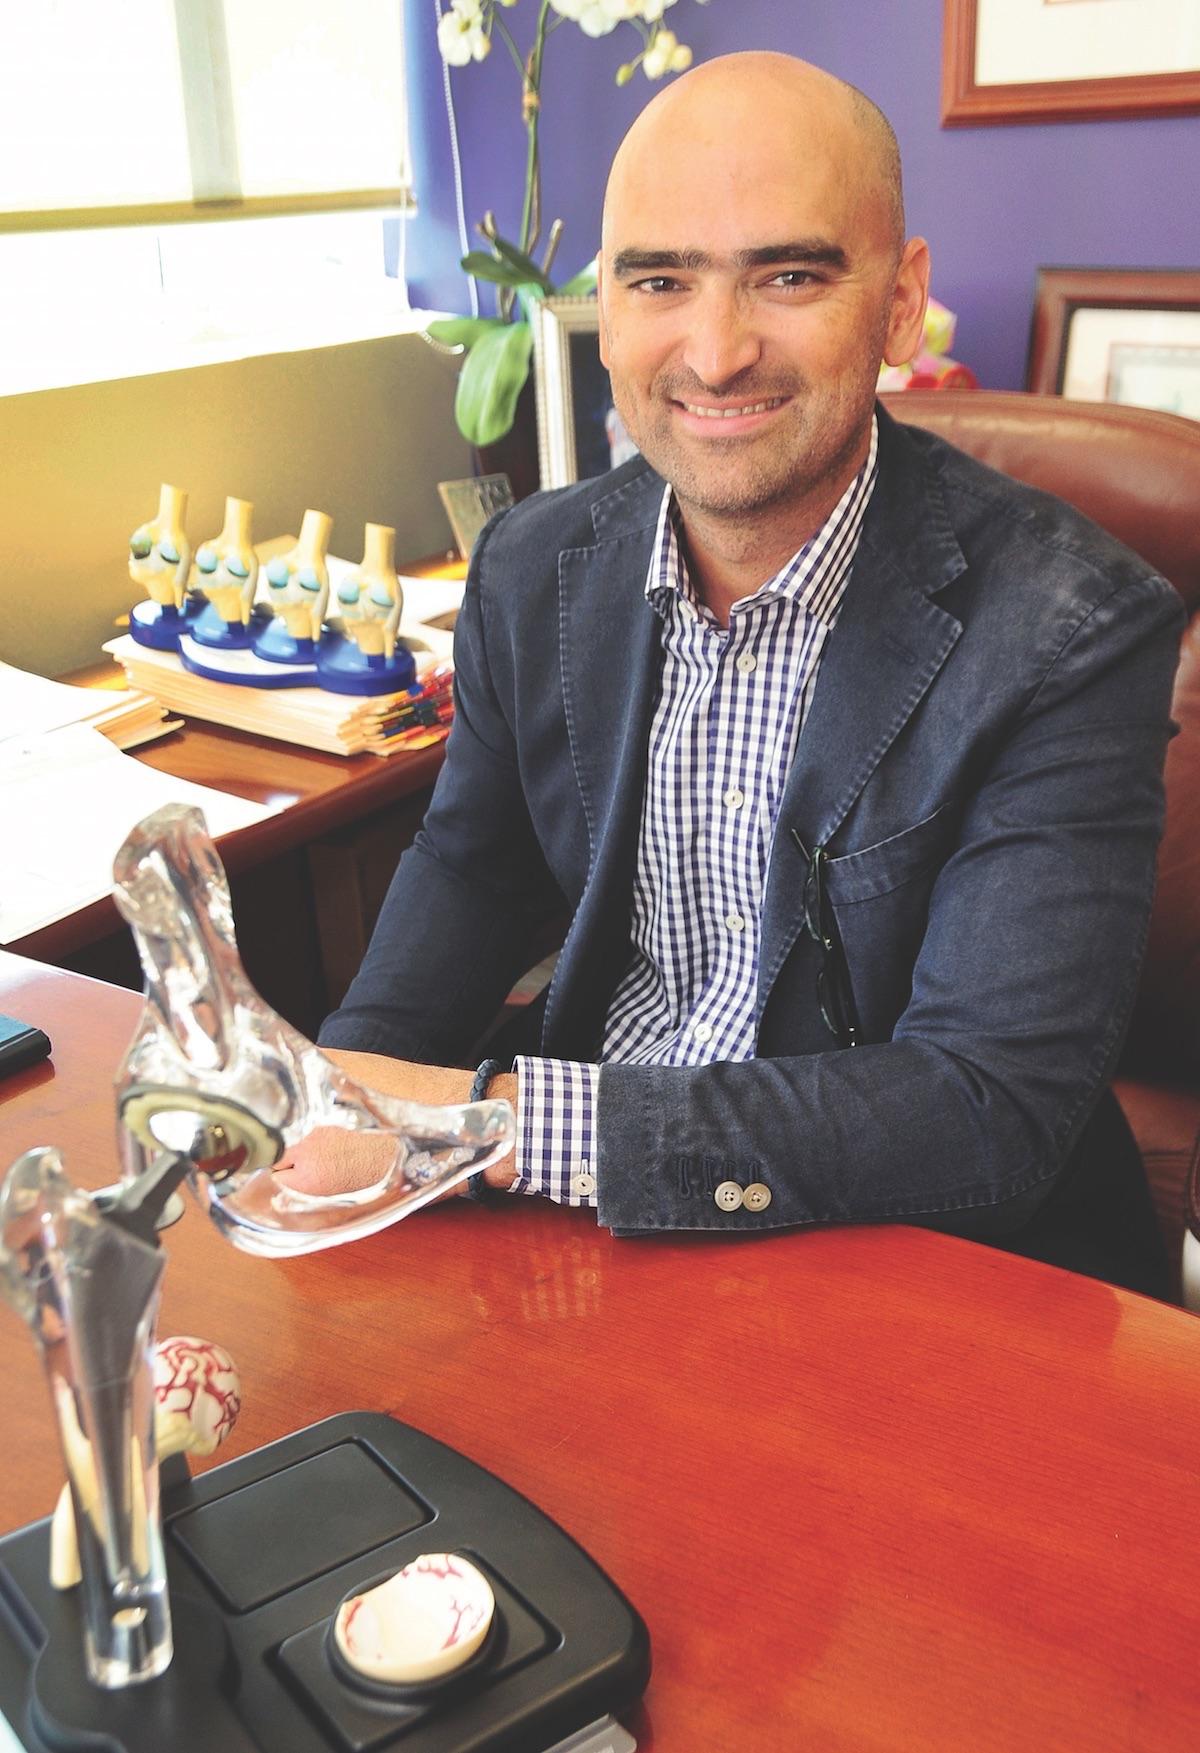 Dr. Ricardo Jesus Reina Sanabria, president of the Puerto Rican Society of Orthopedics and Traumatology.